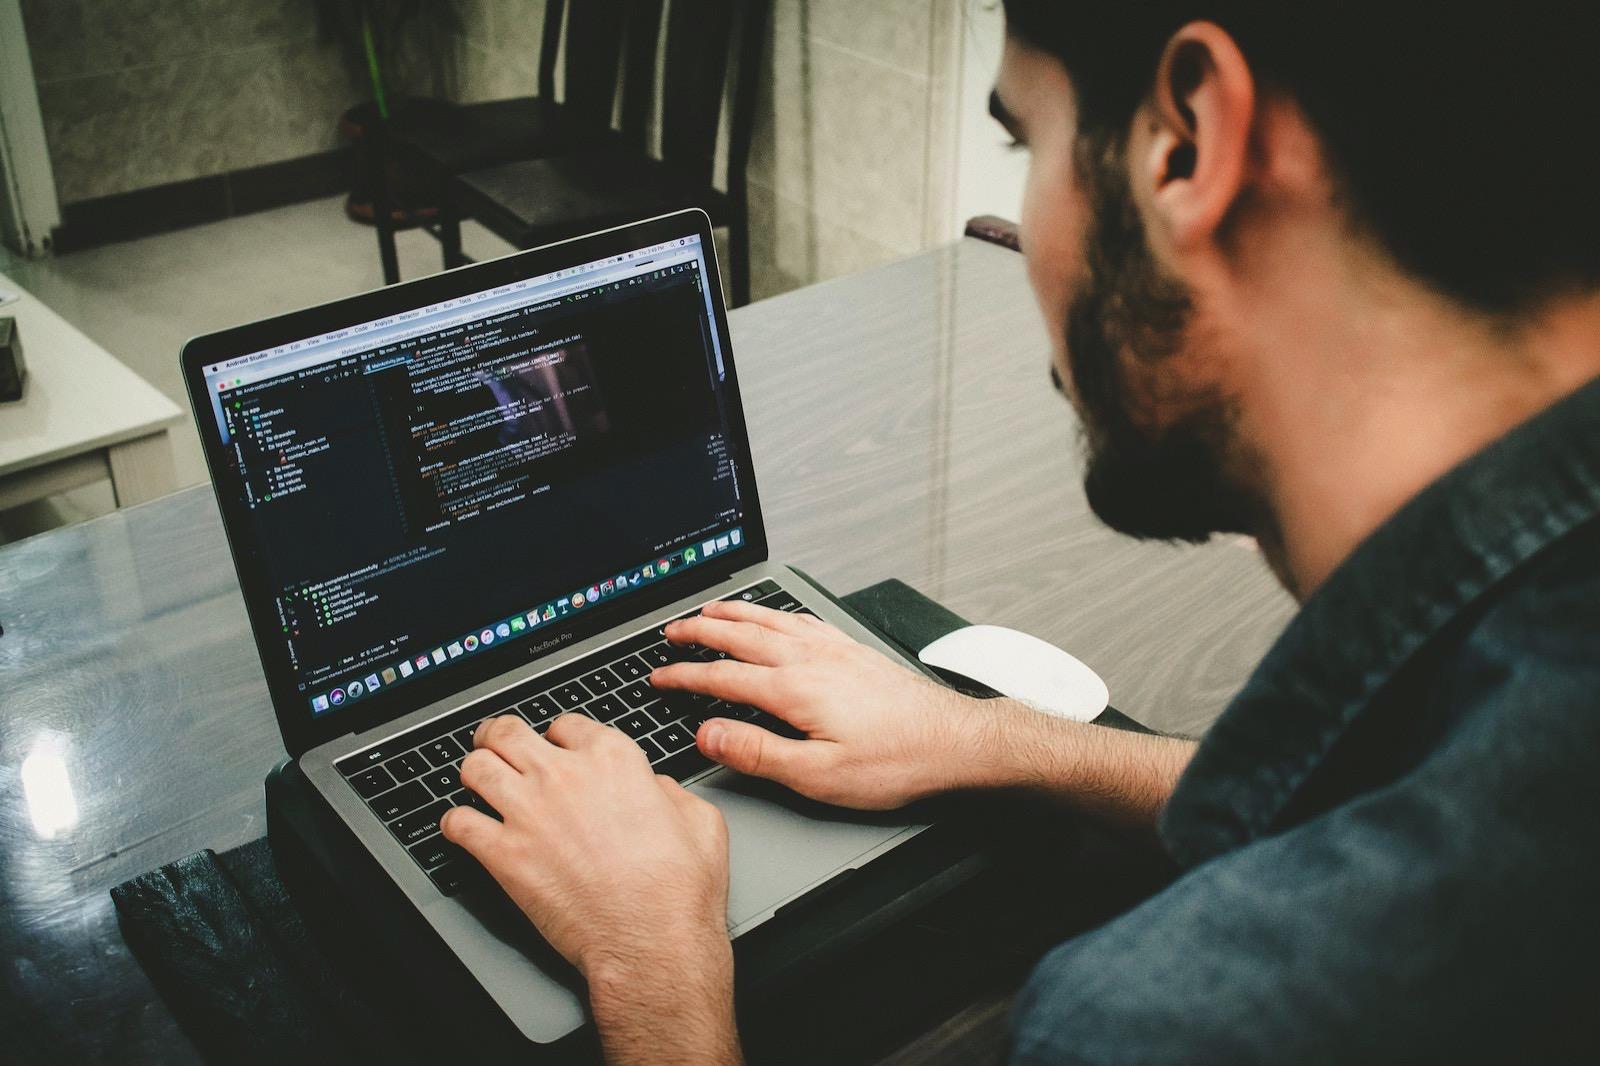 Danial ricaros FCHlYvR5gJI unsplash coding on mac